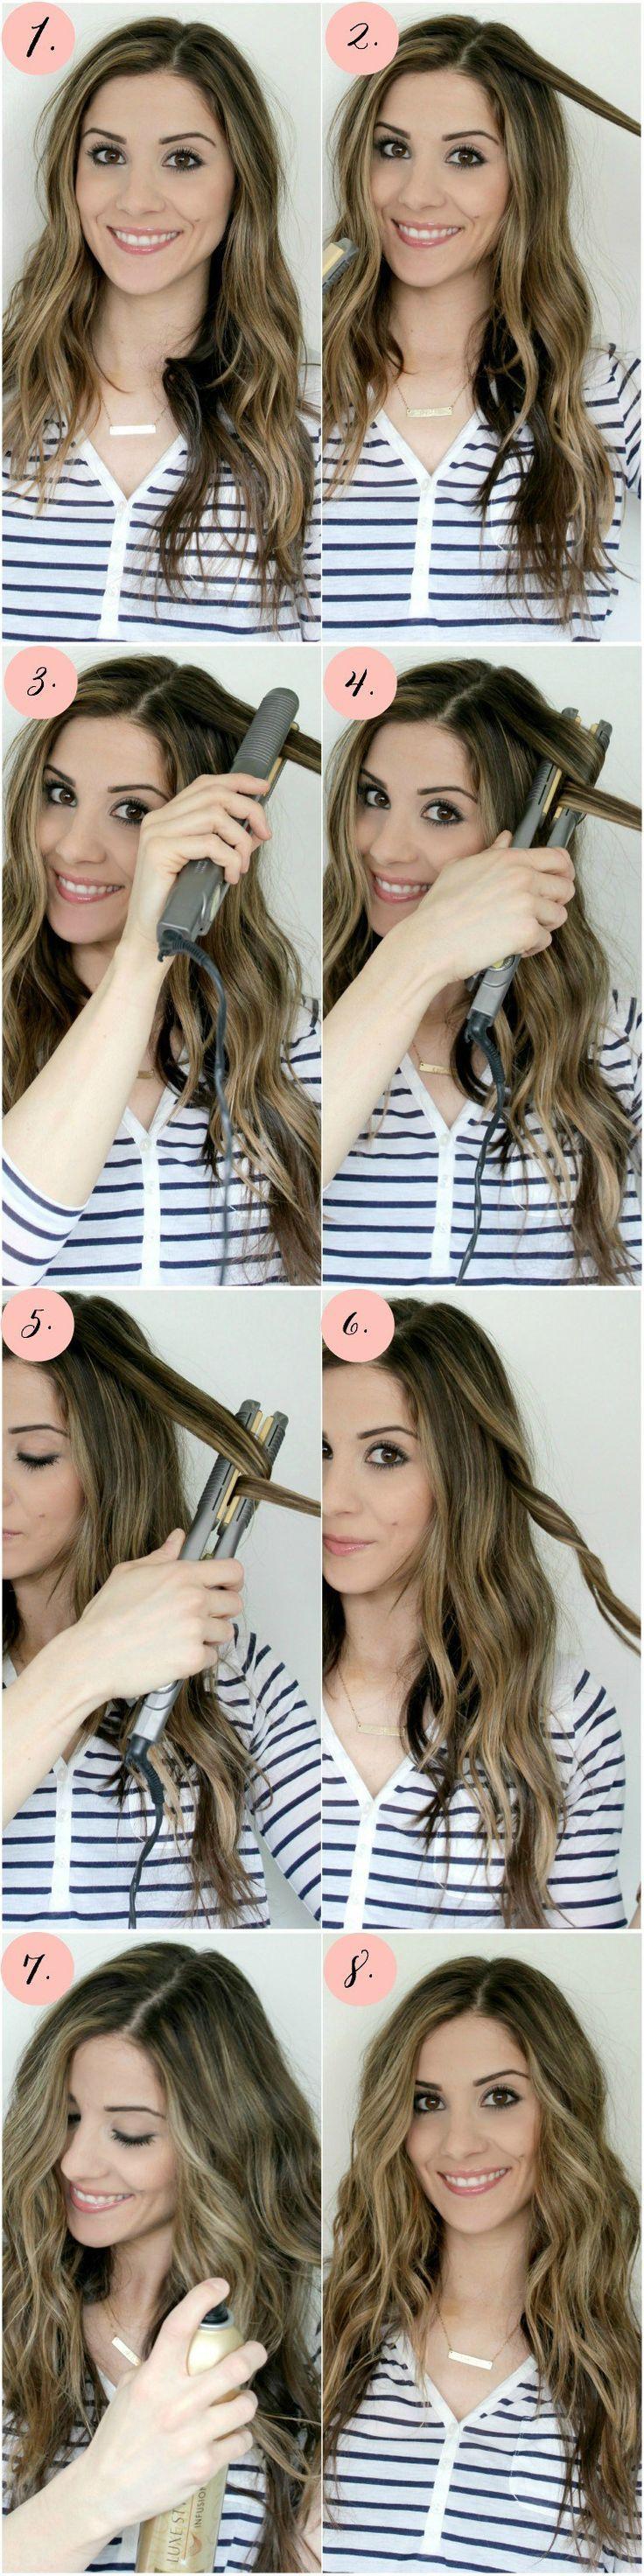 Flat iron curls tutorial hair braiding tutorial flat iron curls